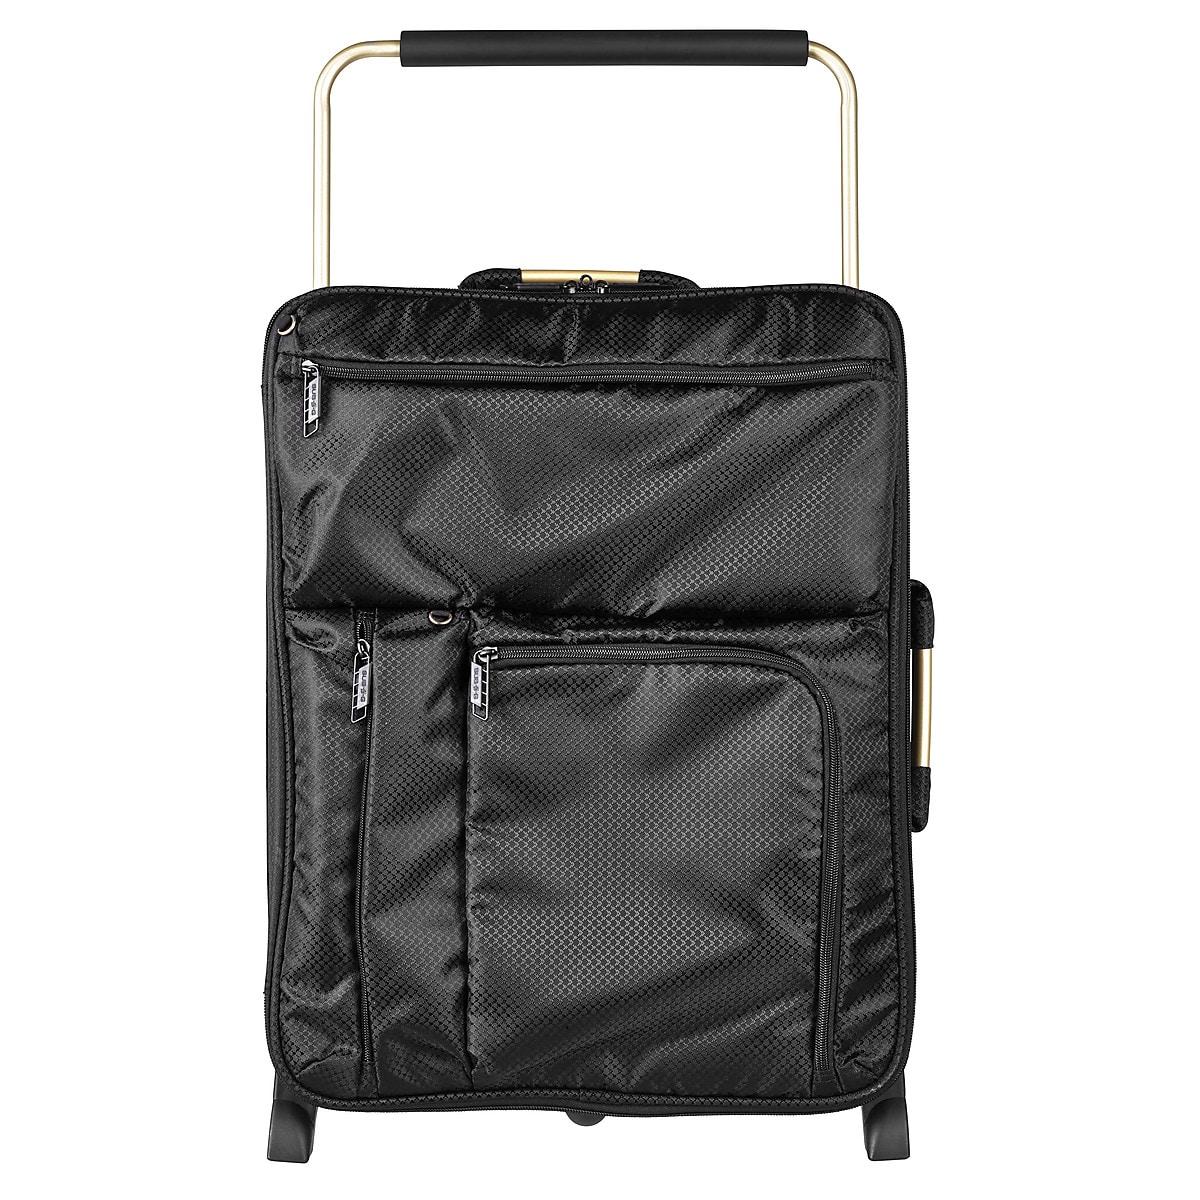 Black IT Suitcase